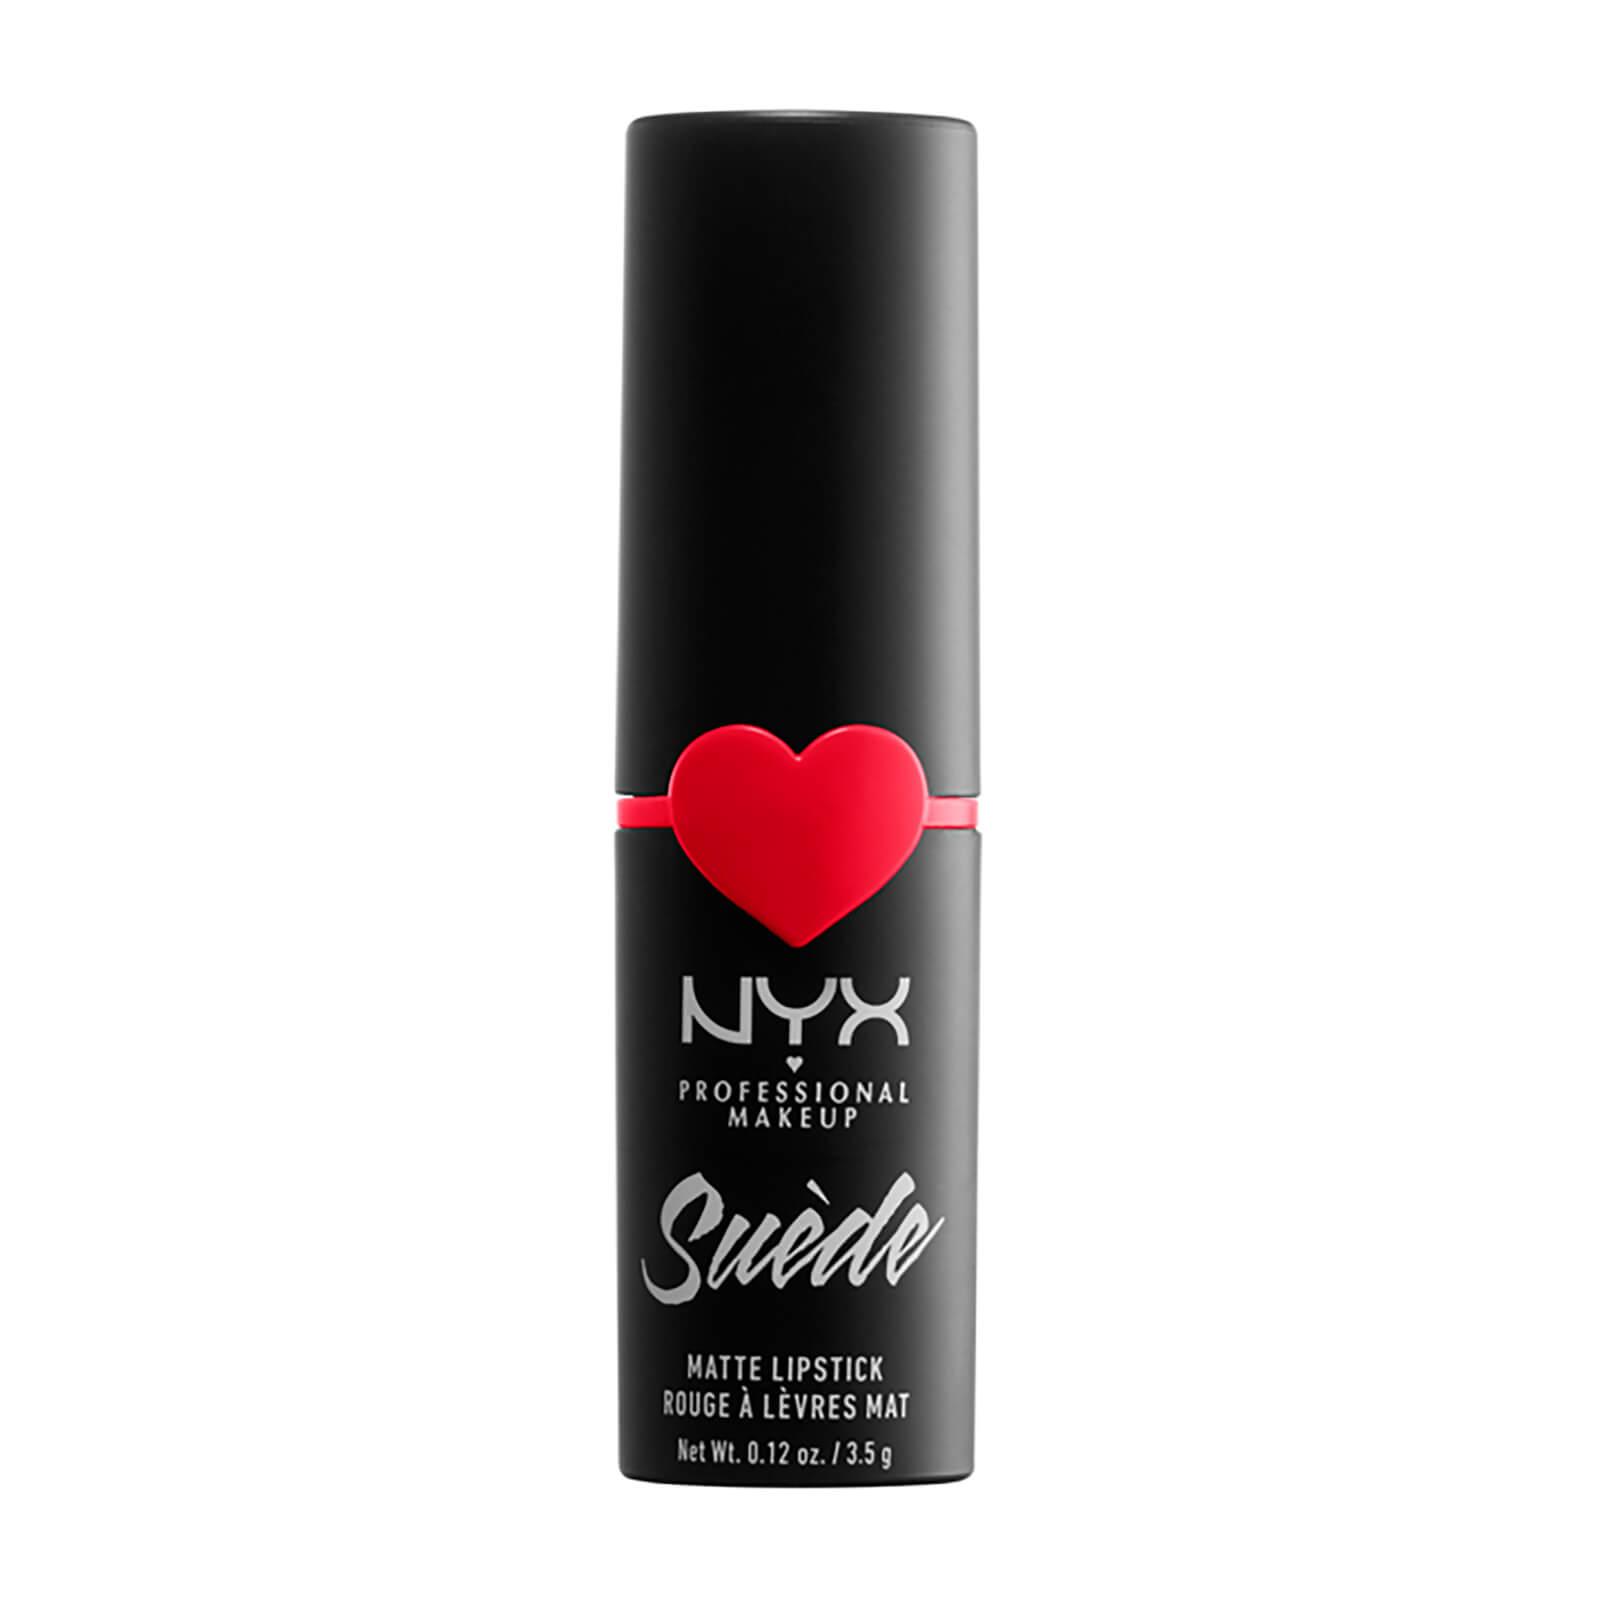 NYX Professional Makeup Suede Matte Lipstick (Various Shades) - Kitten Heels